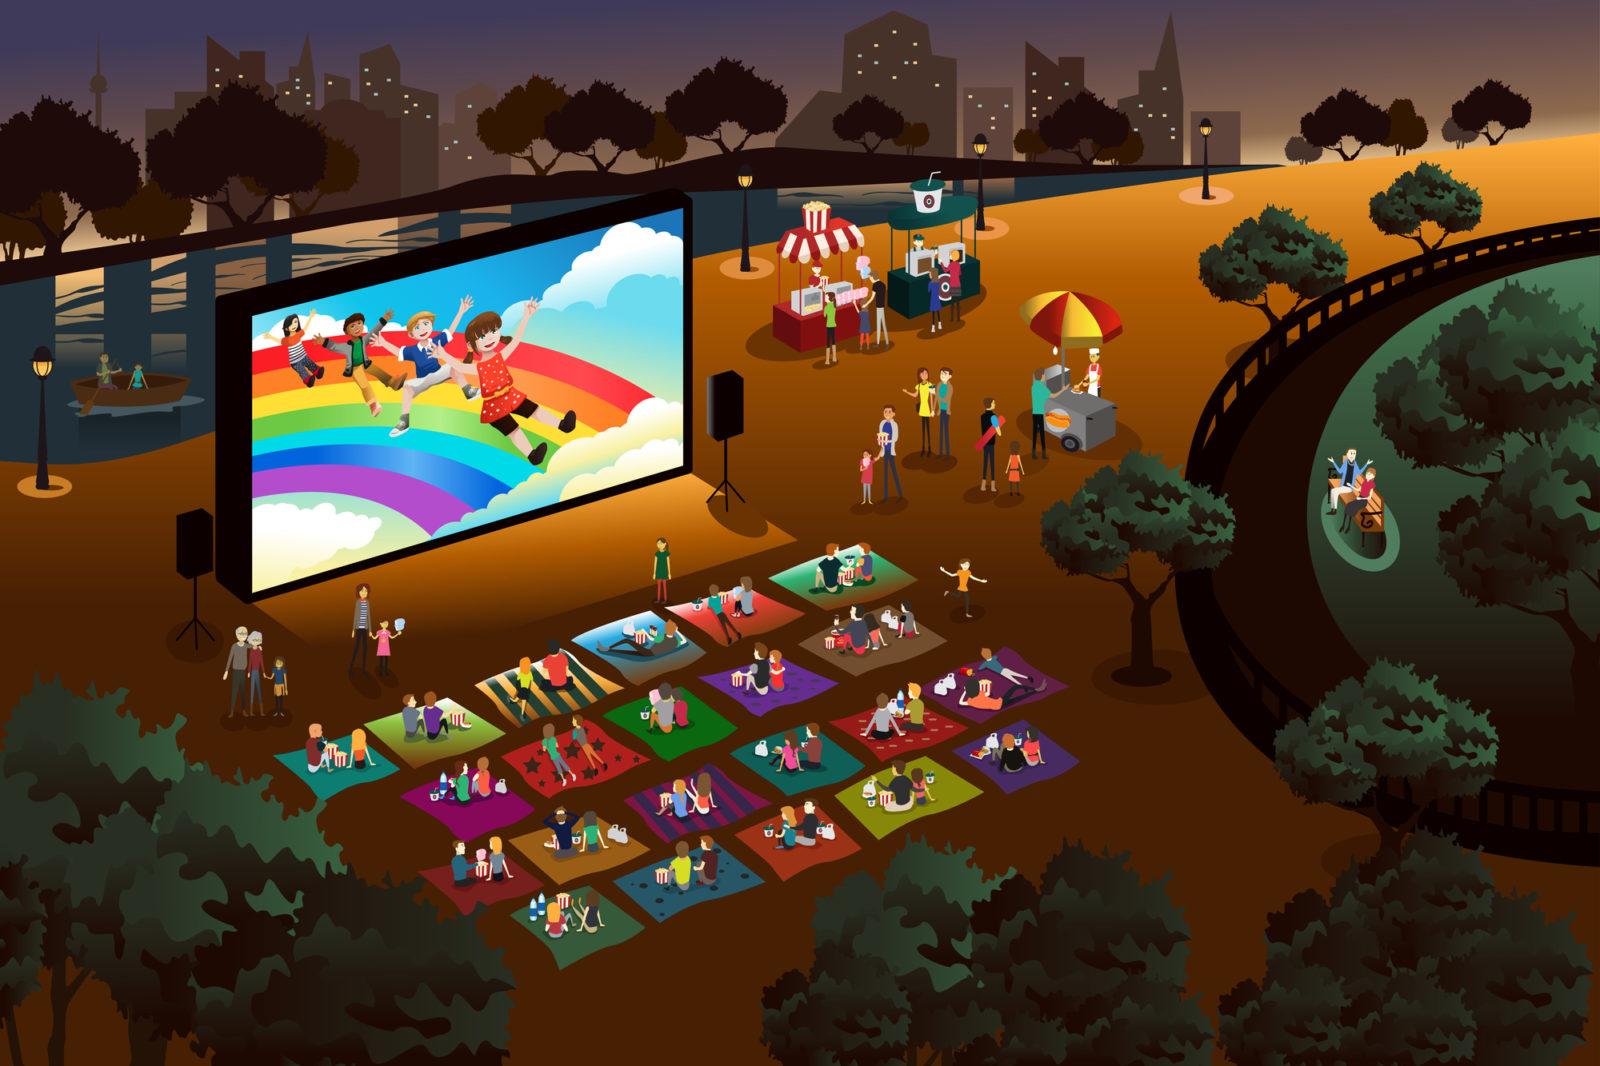 Outdoor Movie Animation